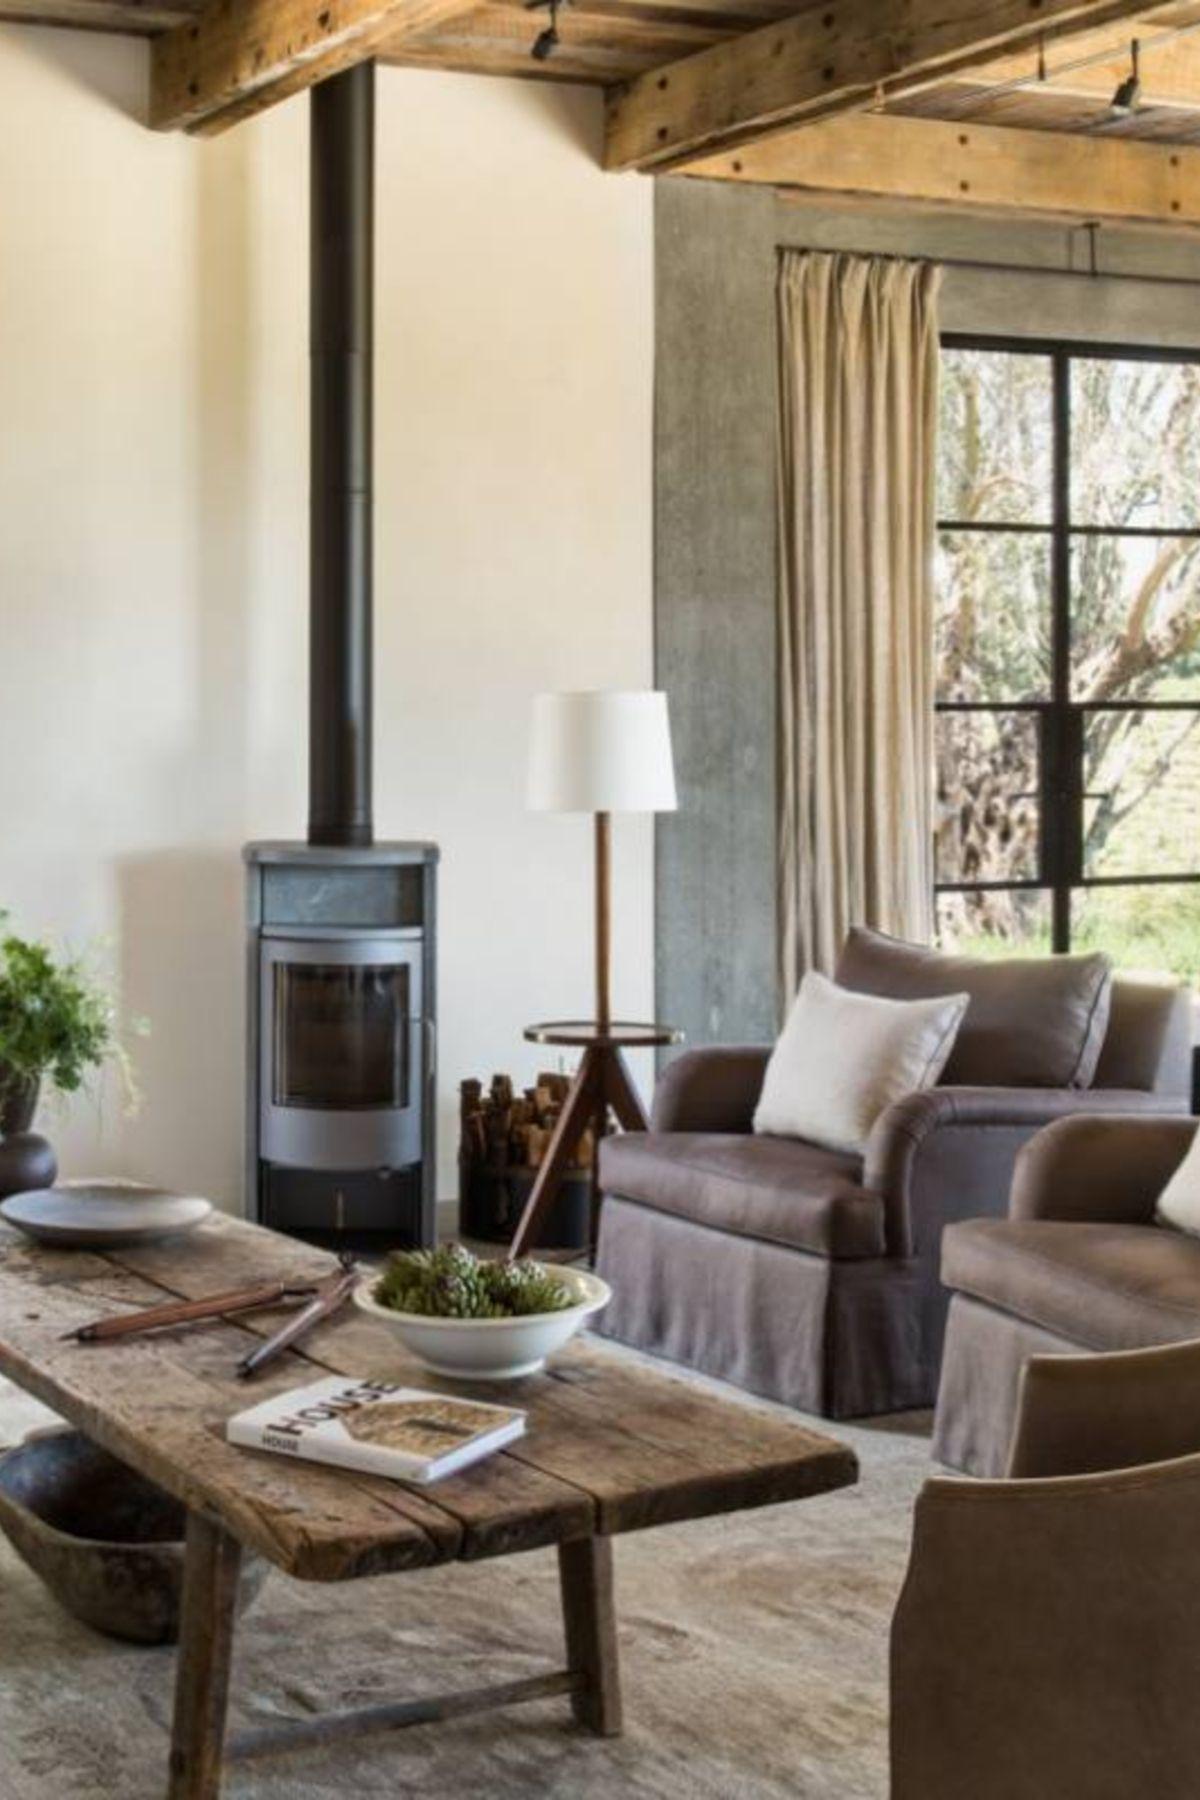 51 rustic farmhouse living room decor ideas rustic